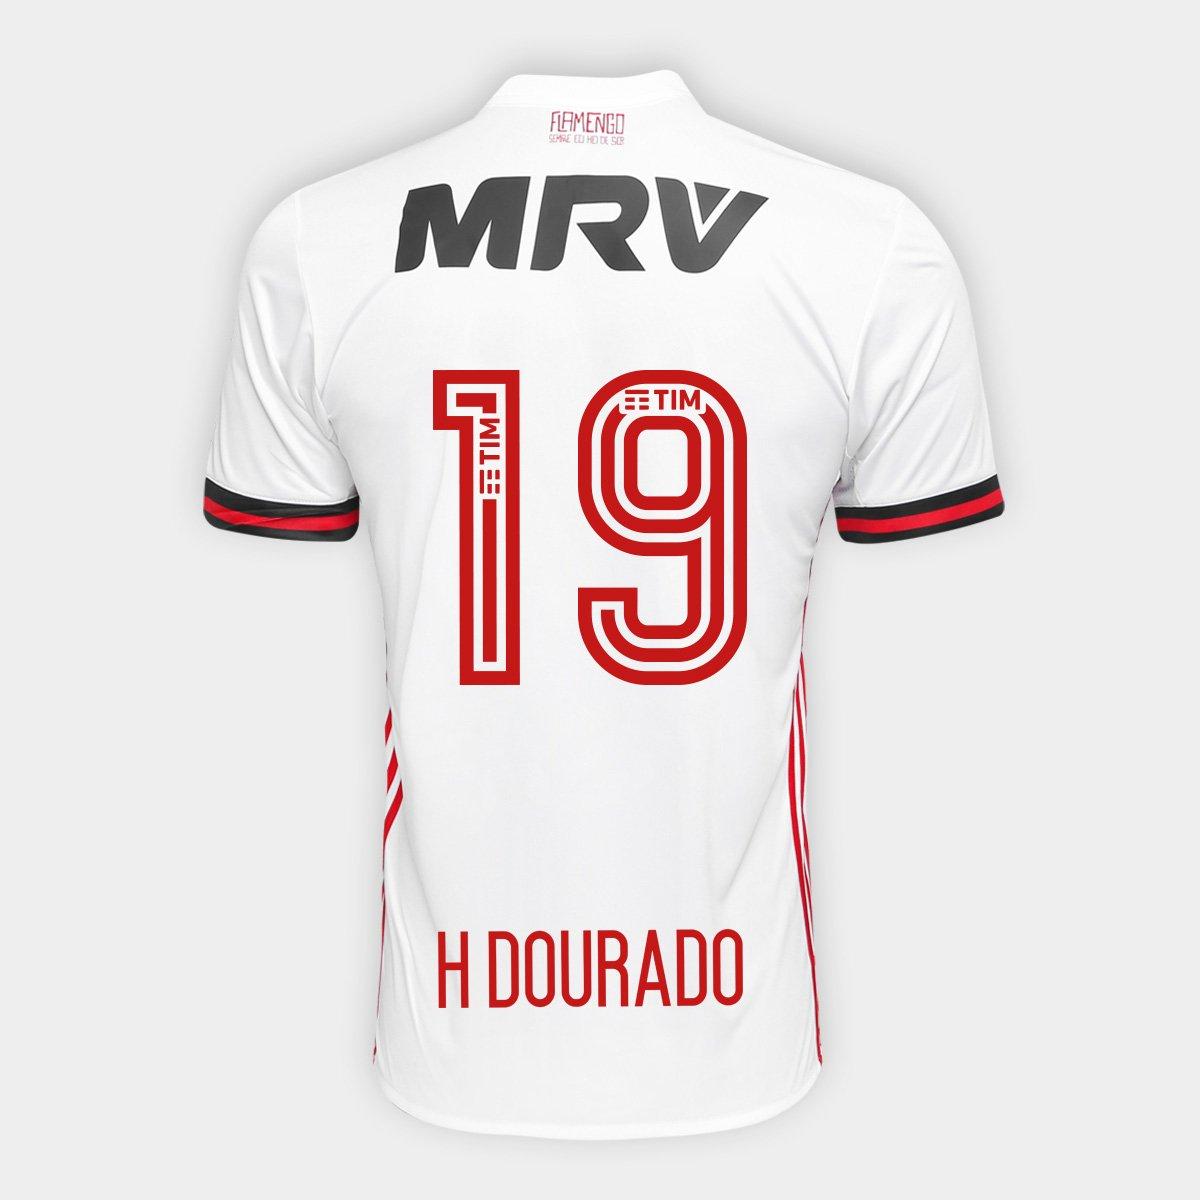 4b177d5554 Camisa Adidas Flamengo II 17 18 H Dourado N° 19 Torcedor Masculina - Compre  Agora